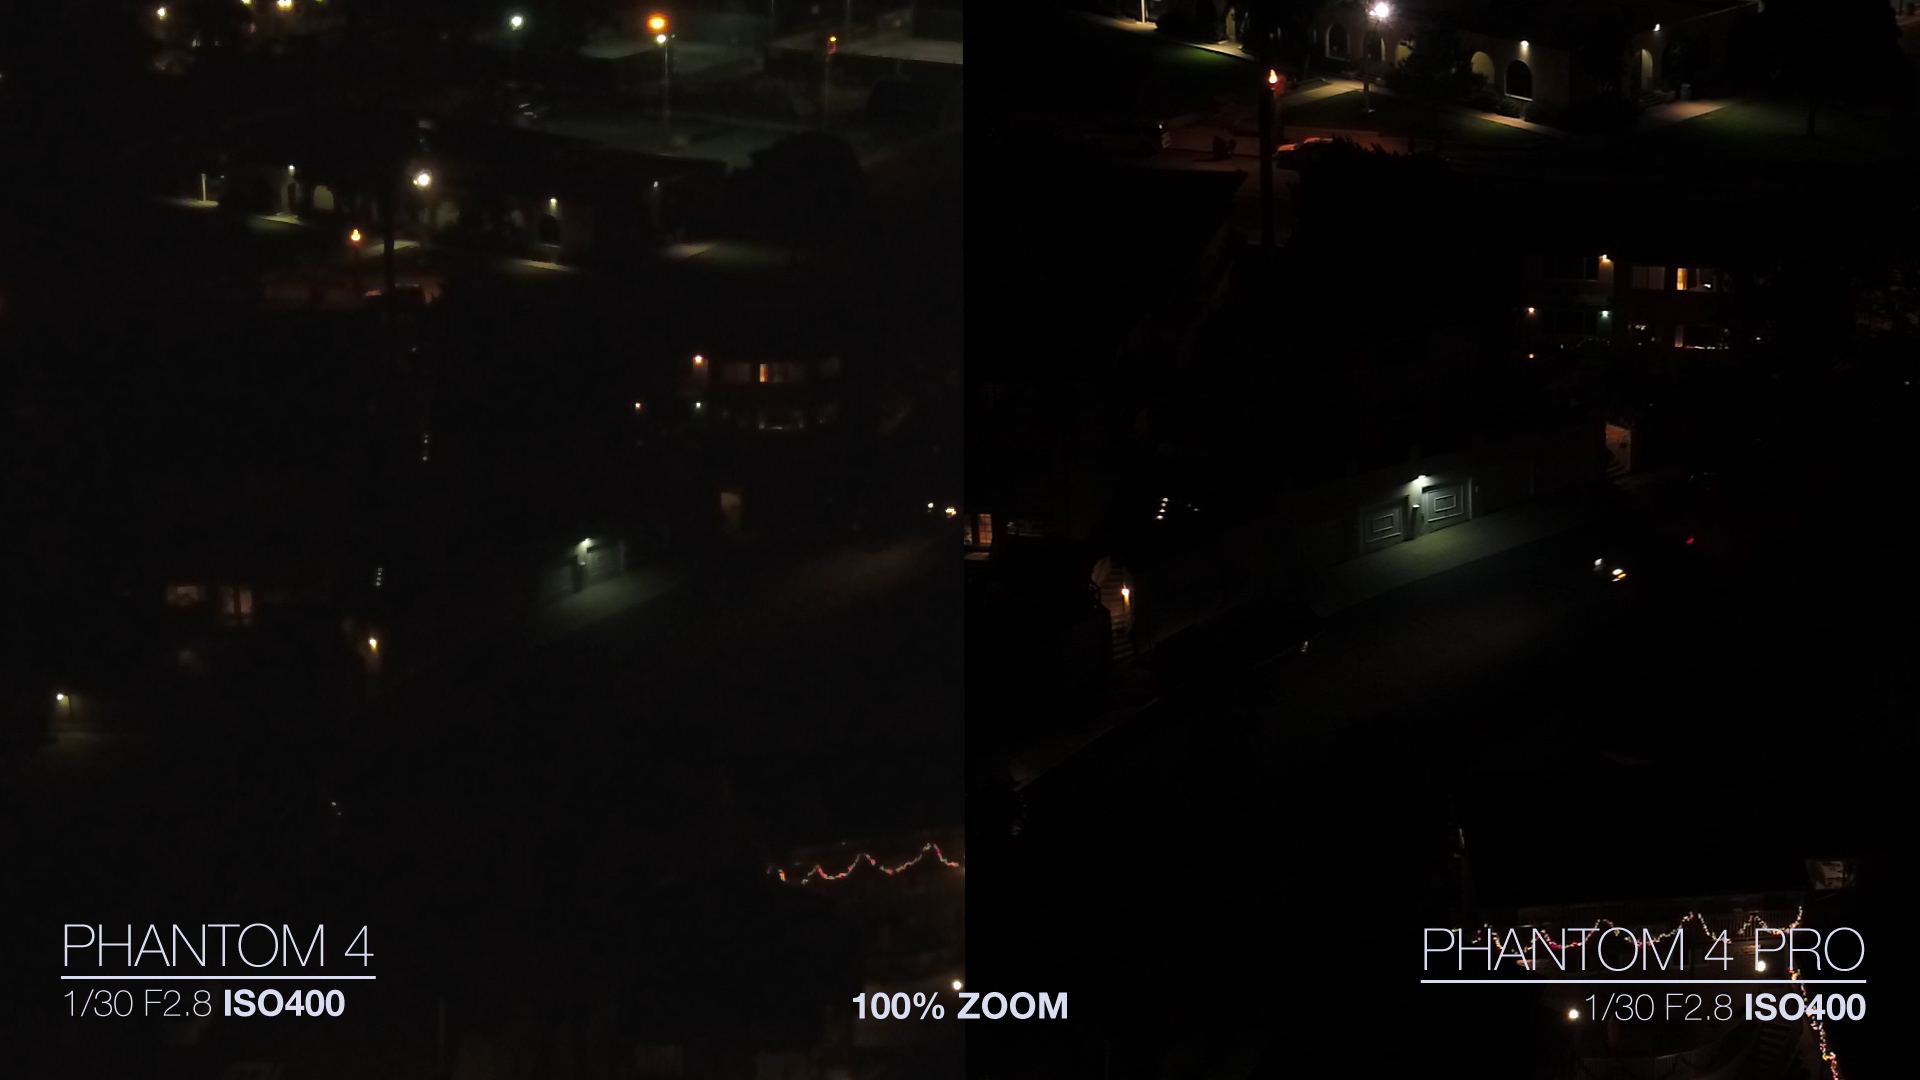 DJI Phantom 4 Pro VS Phantom 4 Low light Video ISO Comparison